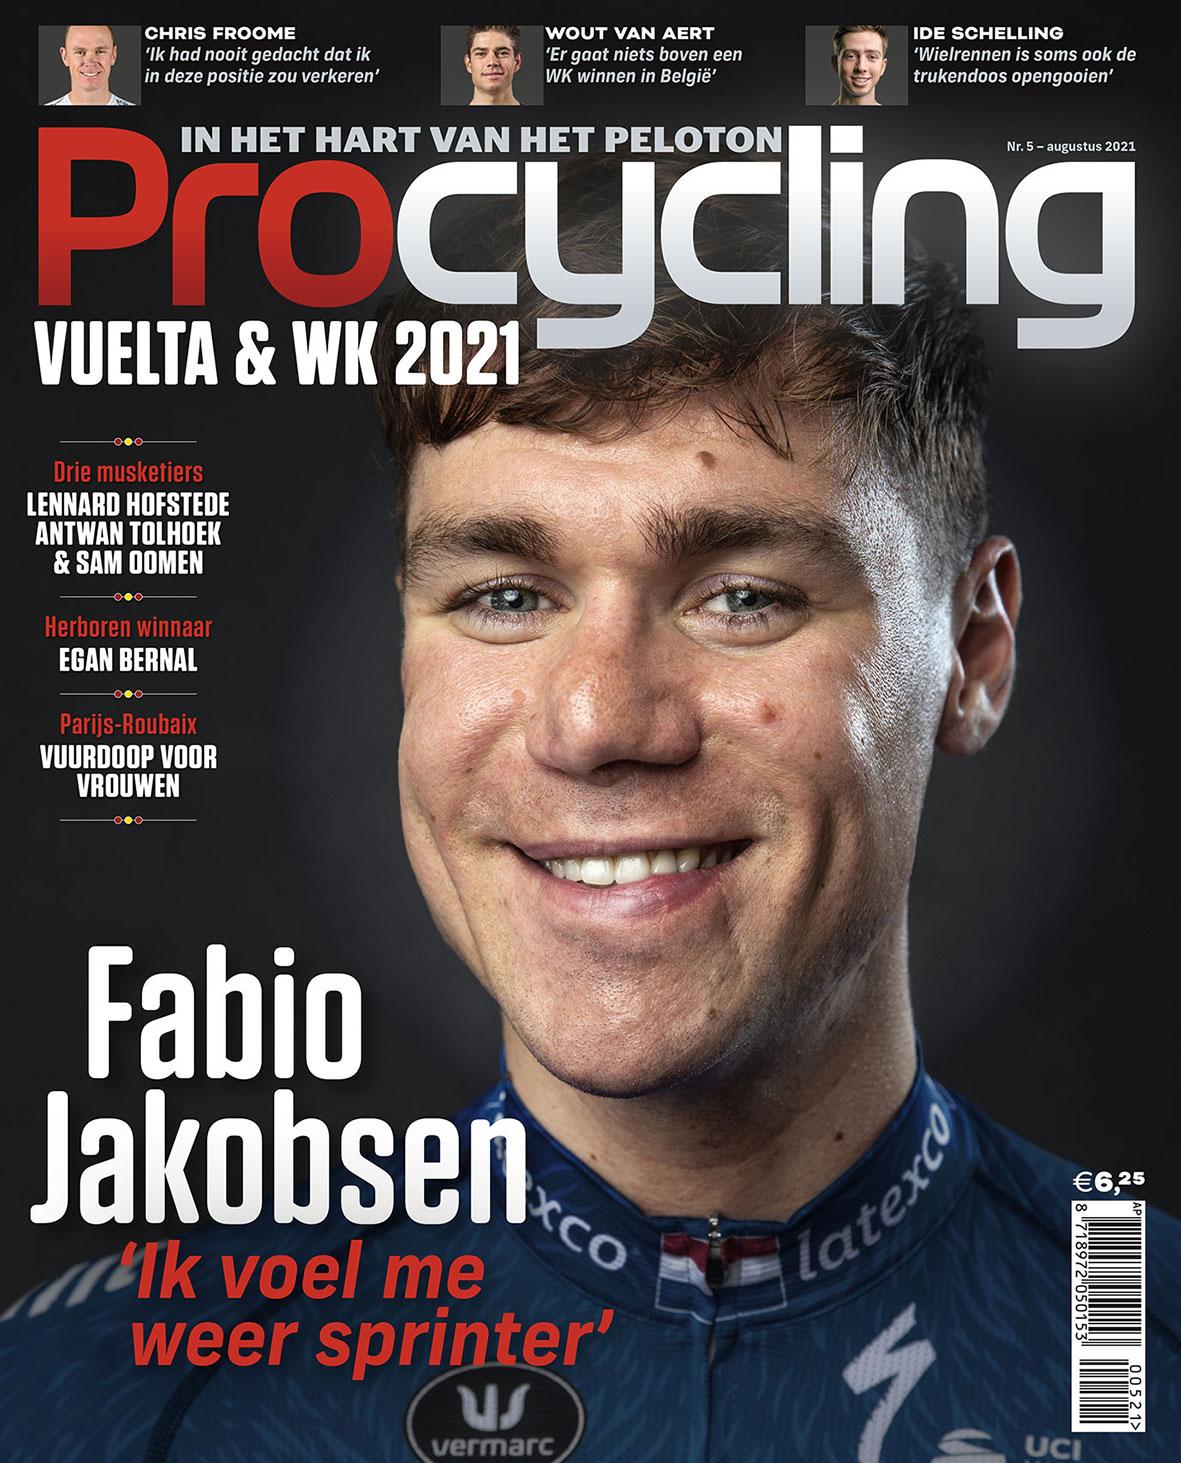 Procycling Vuelta en WK 2021